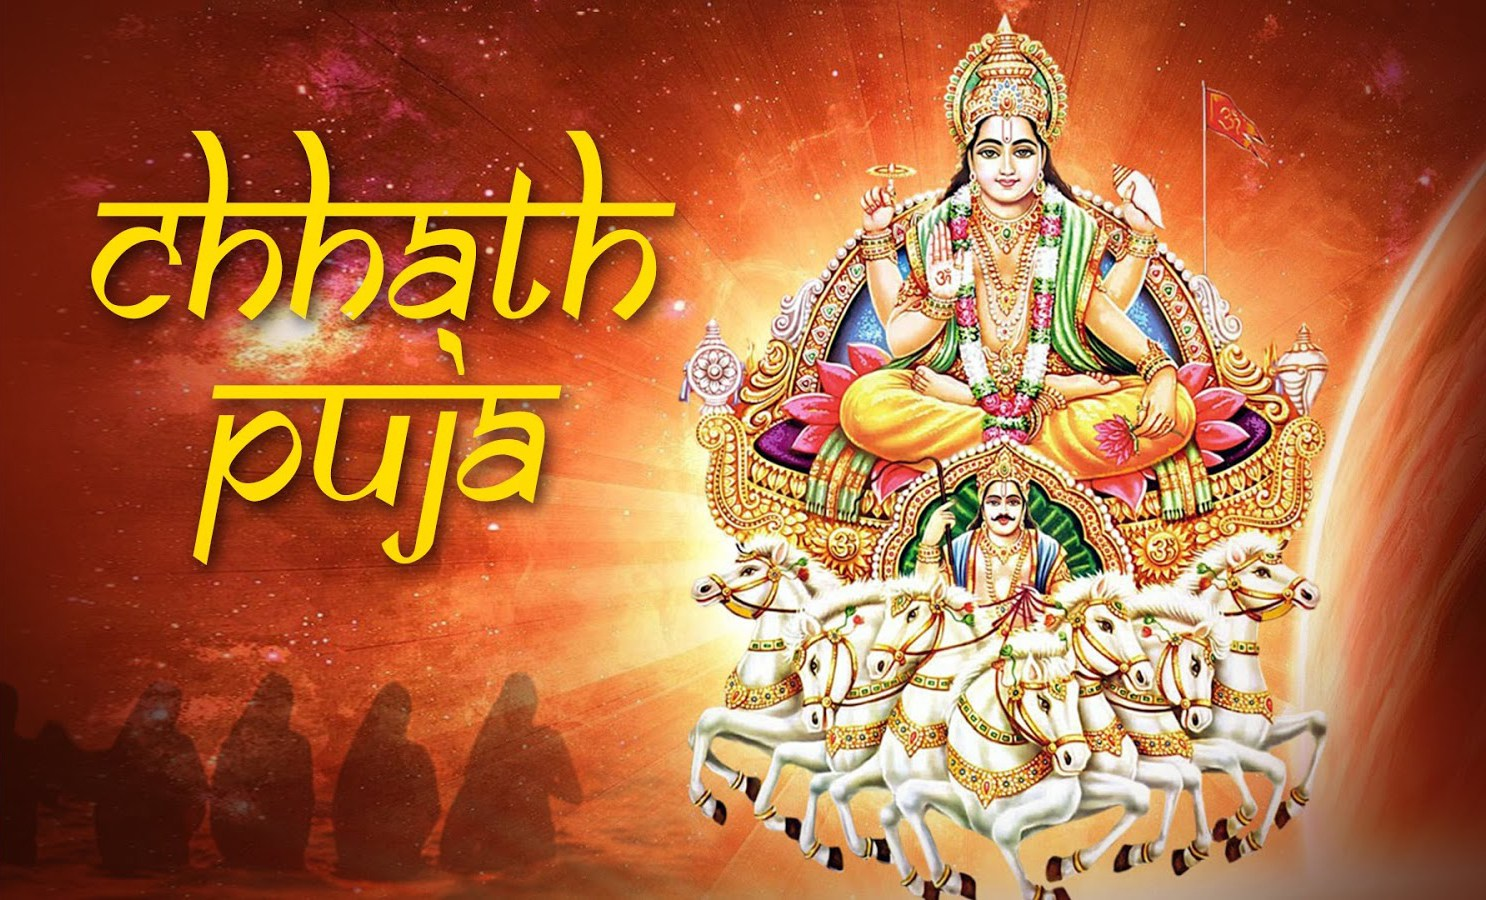 Chhath Puja Image Free Download Chhath Puja Image Happy Chhath